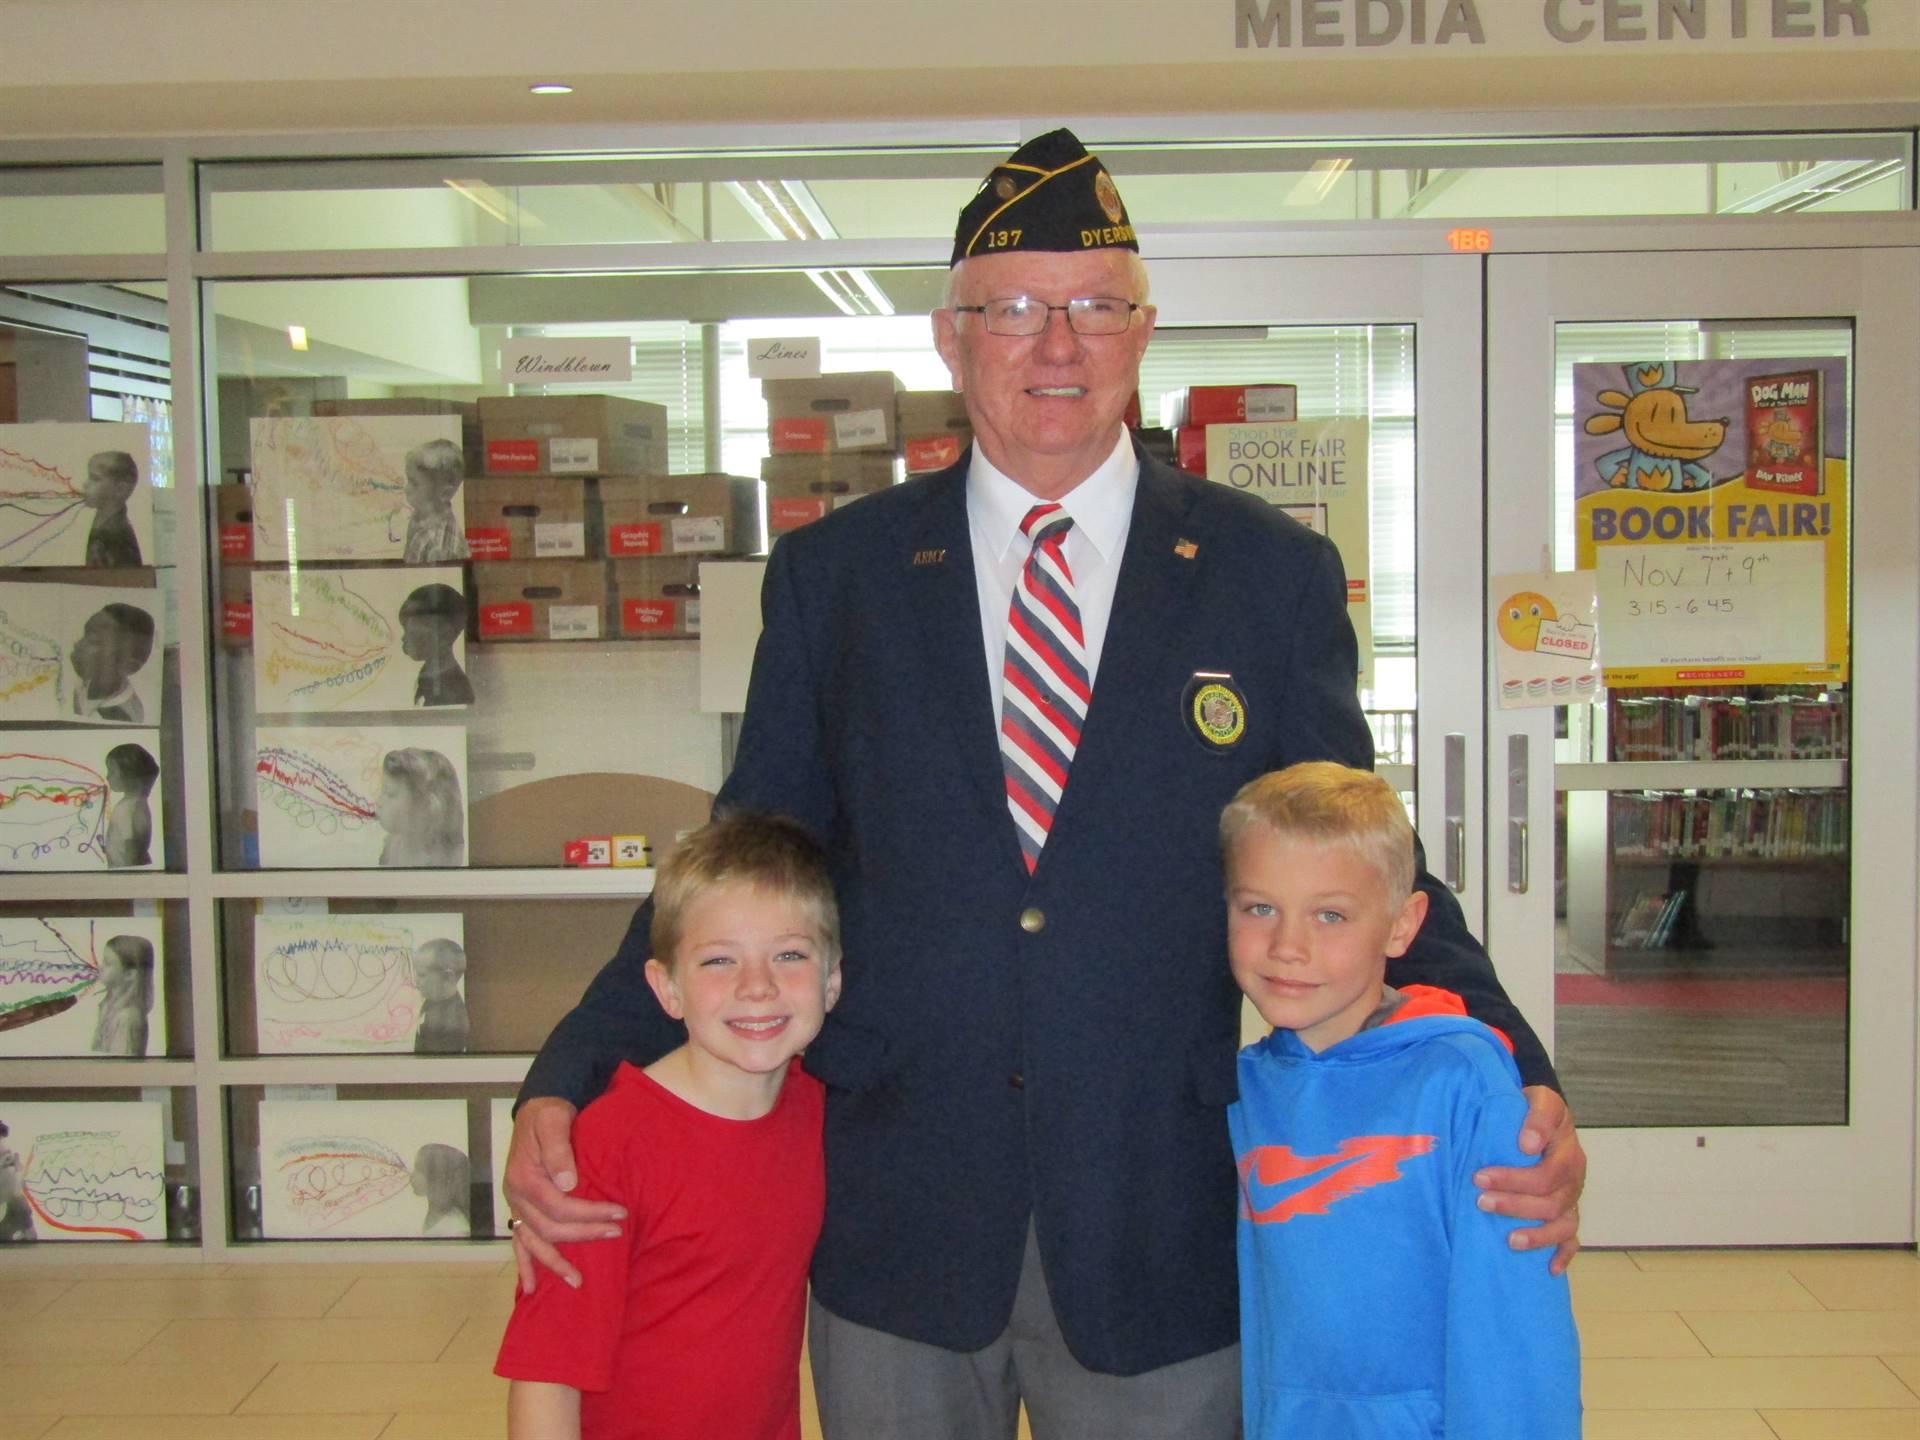 Our grandpa is a veteran.